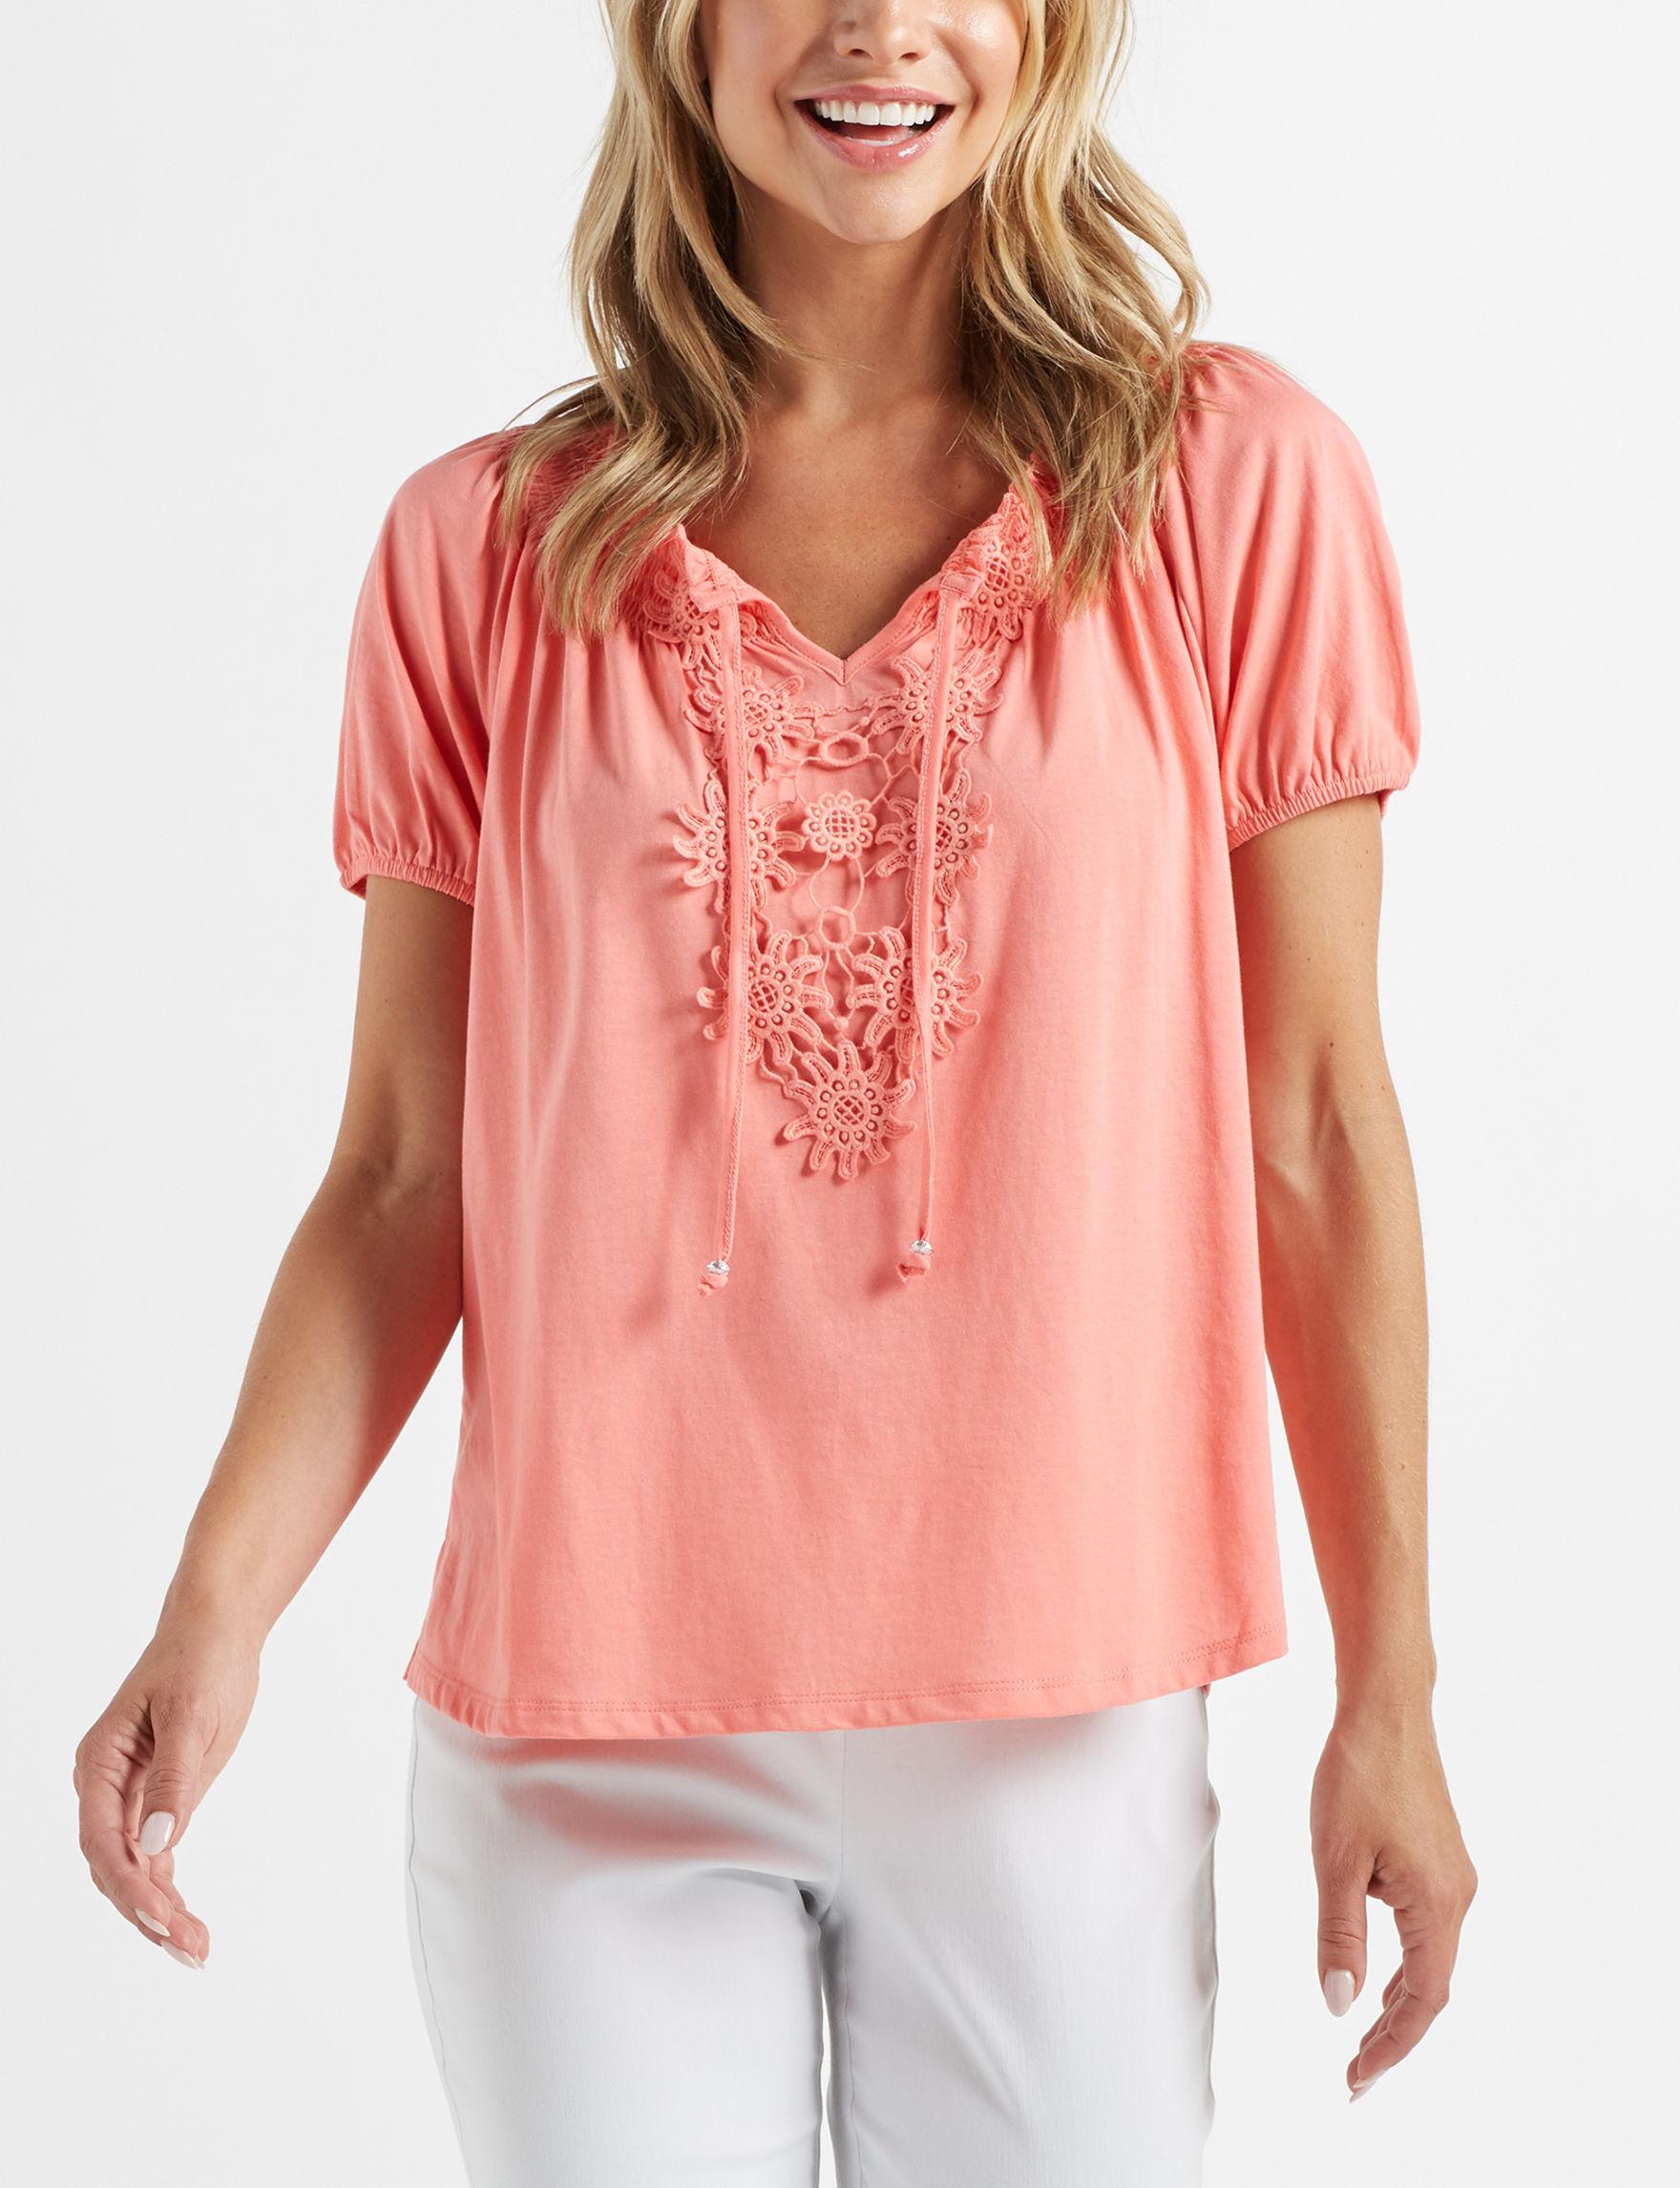 Rebecca Malone Coral Shirts & Blouses